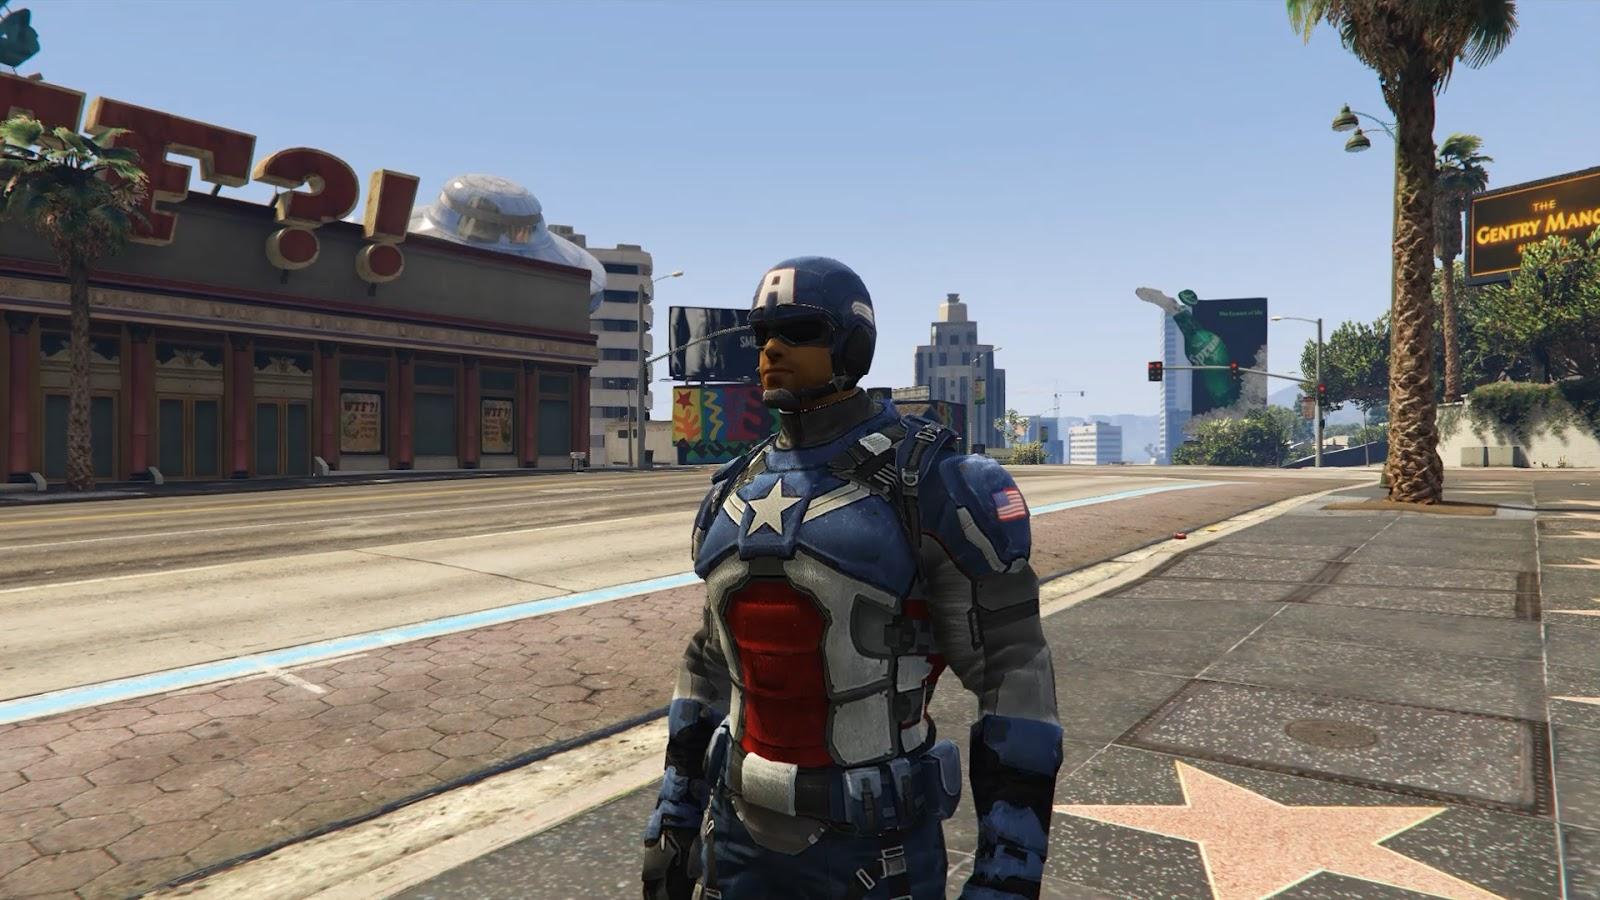 GamesMods17 : Captain America Modern Soldier + Shield [Add